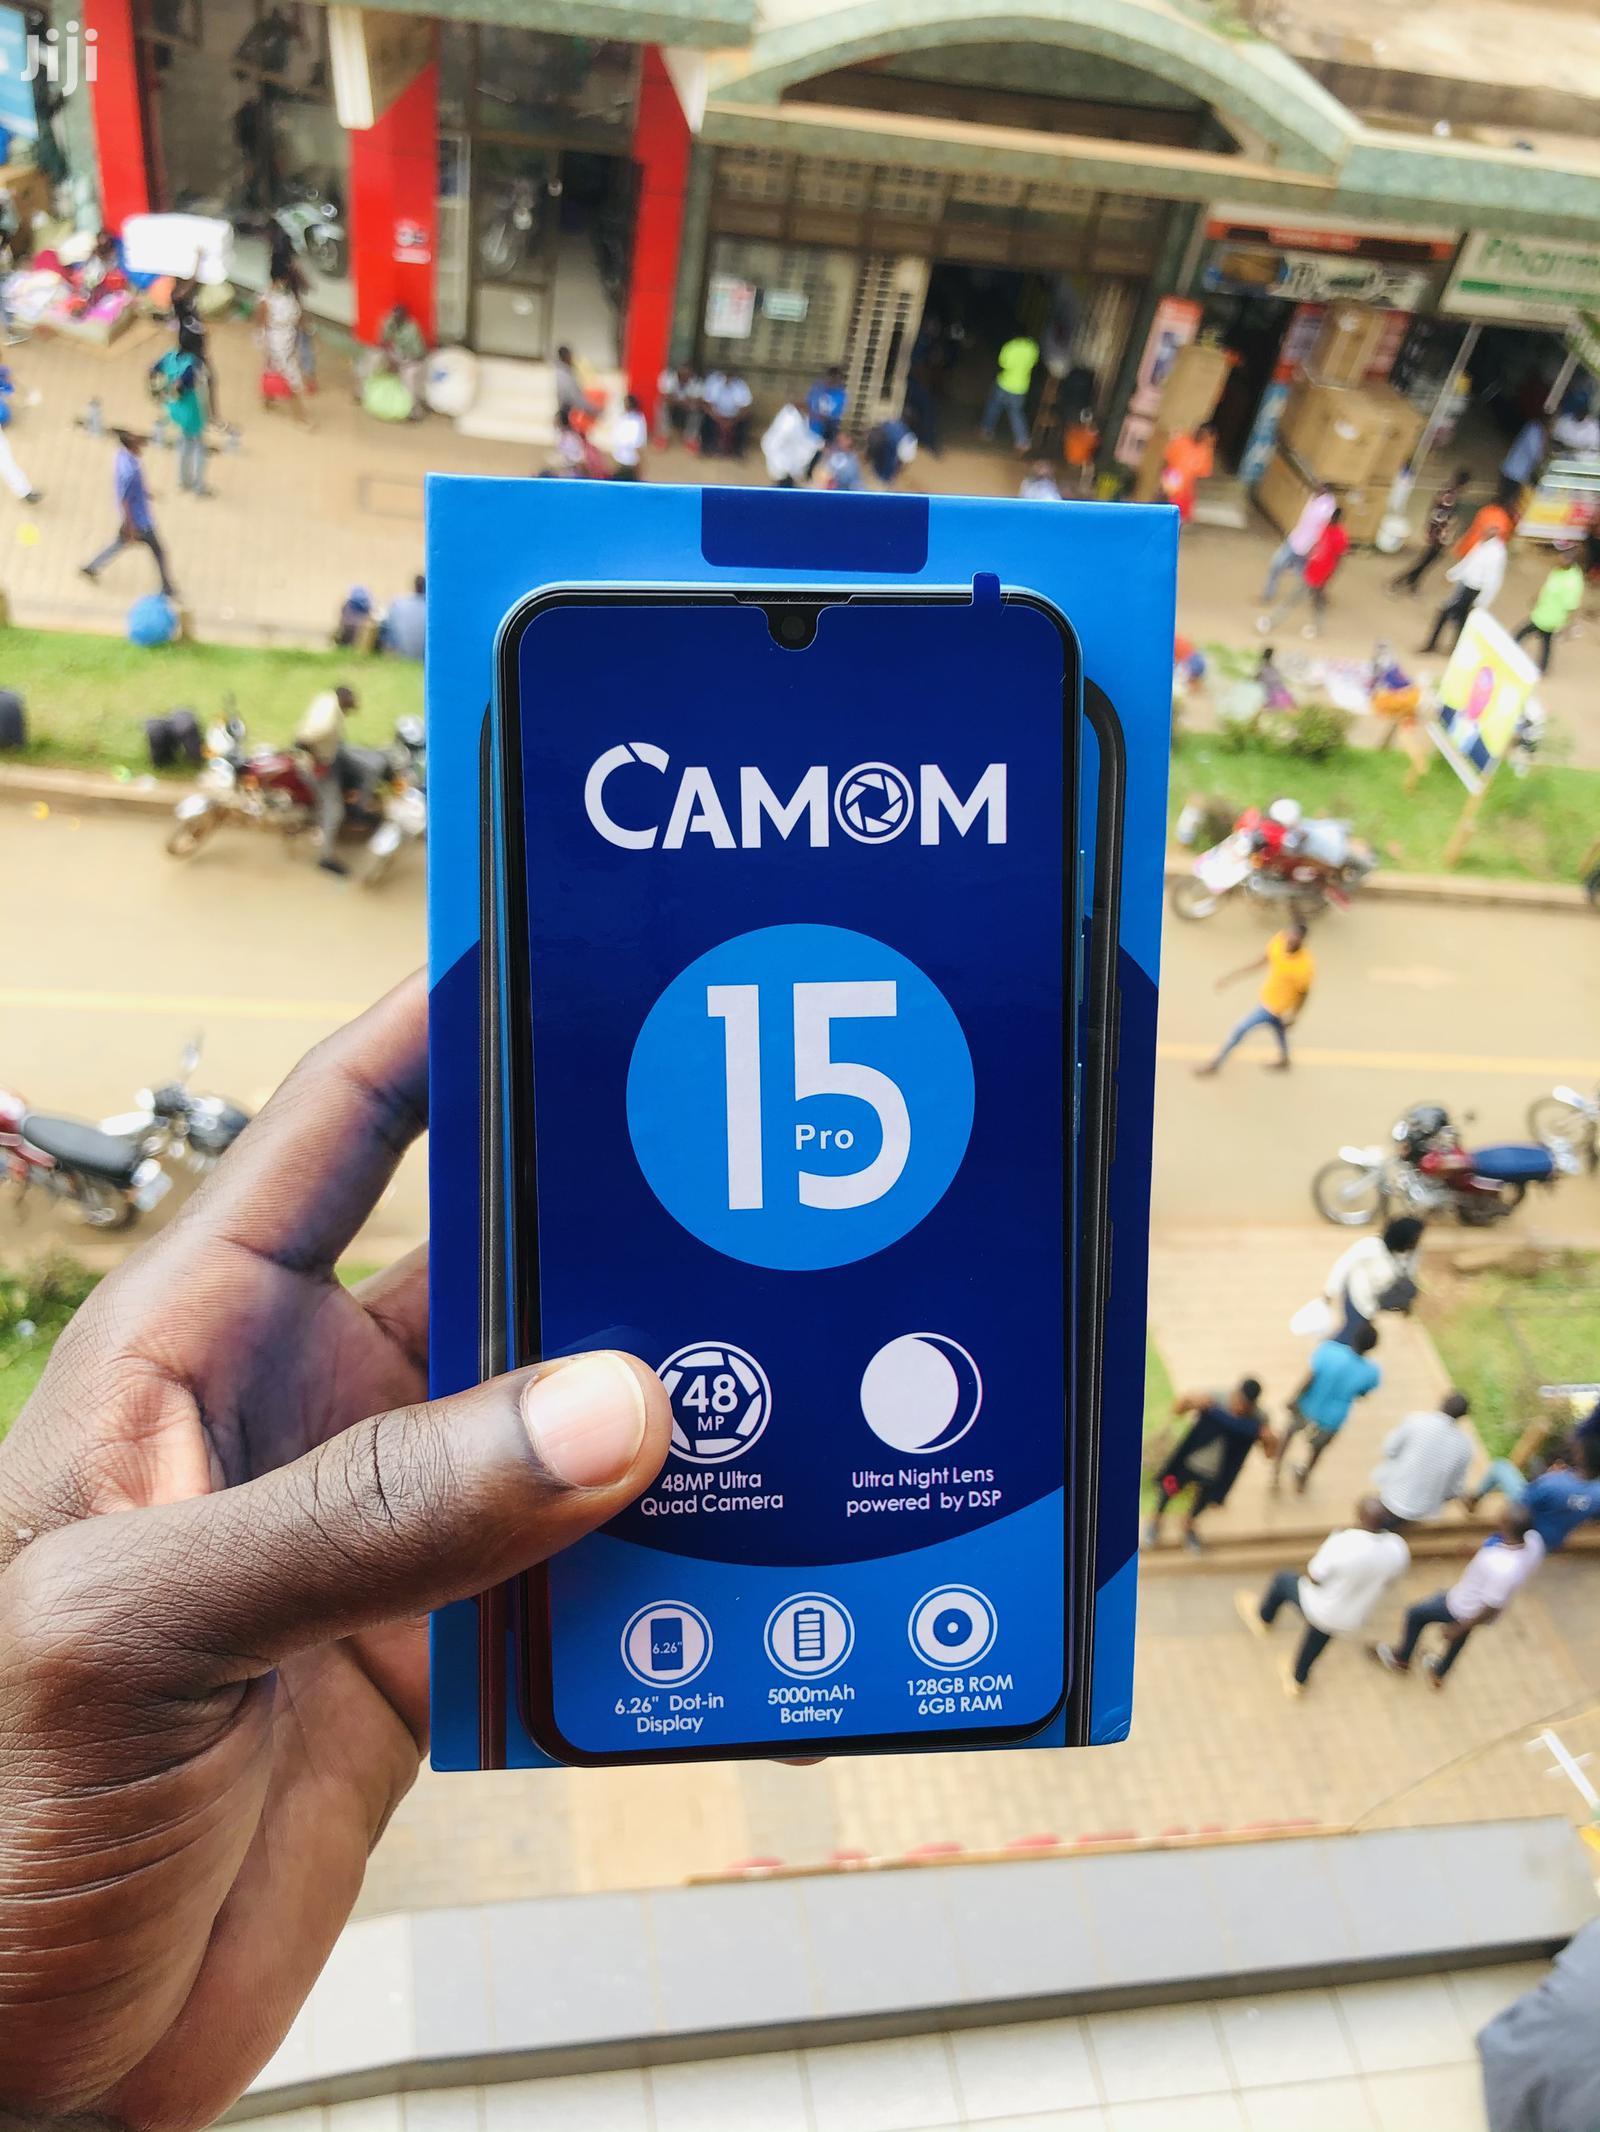 New Tecno Camon 15 Pro 128 GB